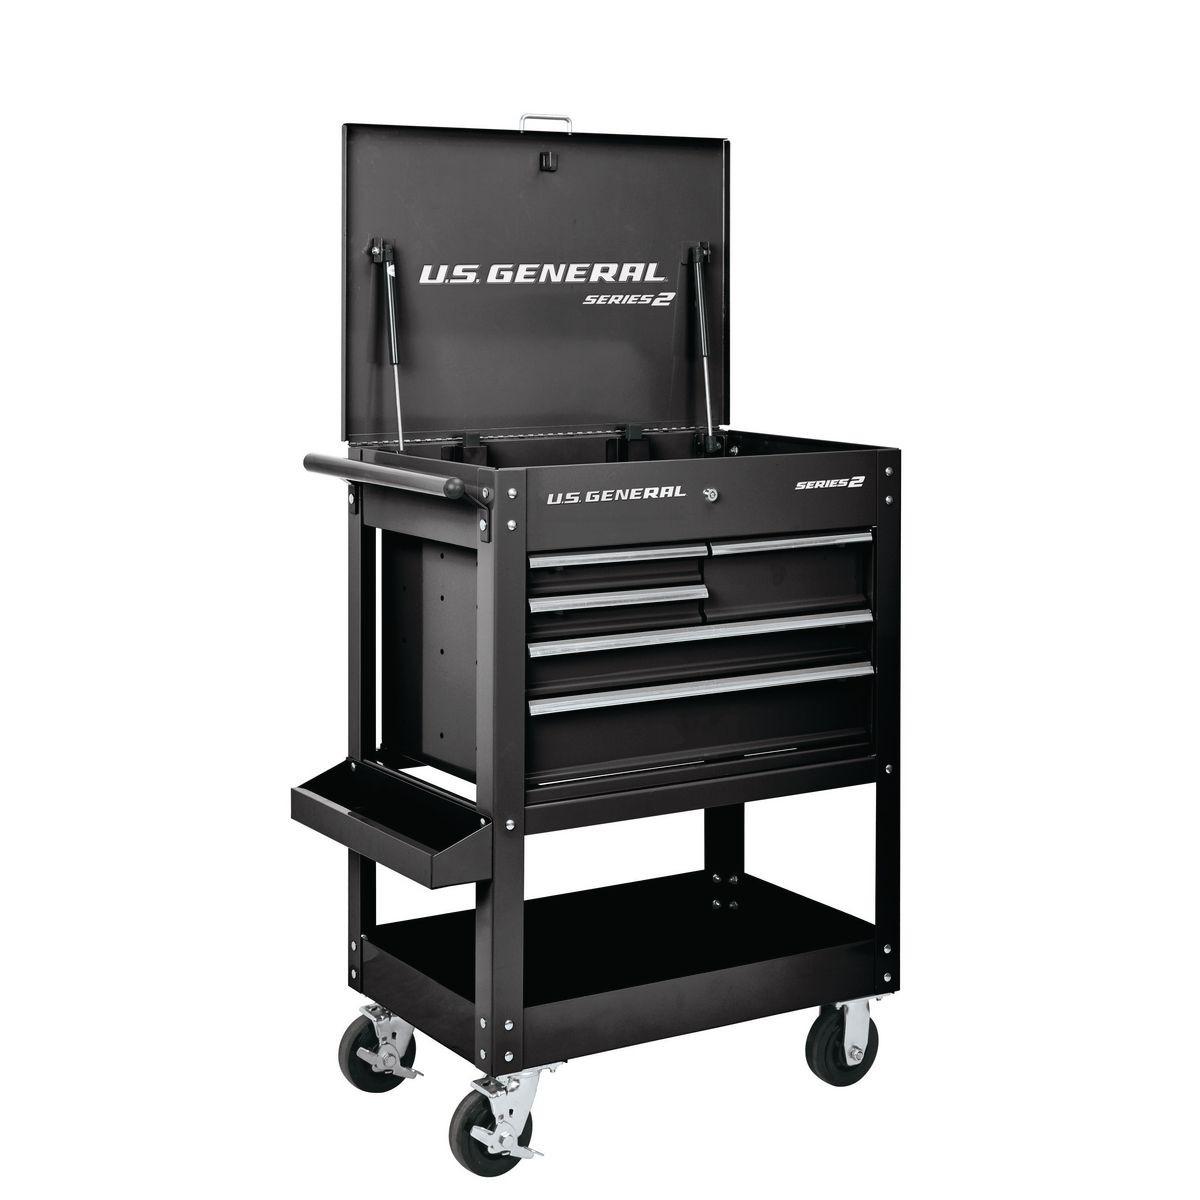 U.S. GENERAL 30 In. 5 Drawer Mechanic's Cart - Black - Item 64030 / 64032 / 64033